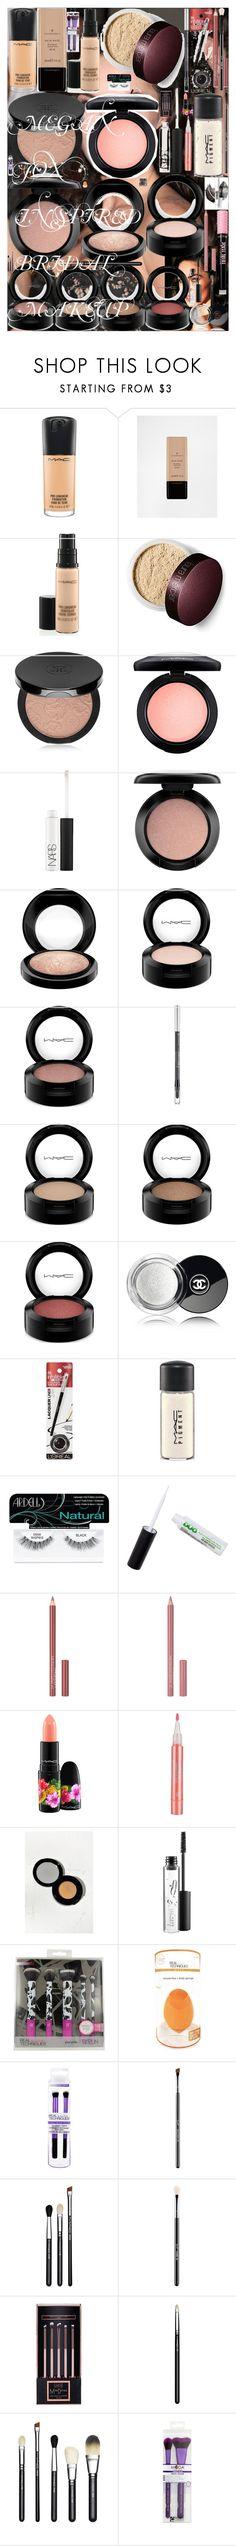 MEGAN FOX INSPIRED BRIDAL MAKEUP by oroartye-1 on Polyvore featuring beauty, MAC Cosmetics, Rouge Bunny Rouge, Illamasqua, NARS Cosmetics, Chanel, Anastasia Beverly Hills, Sigma, Stila and Inglot